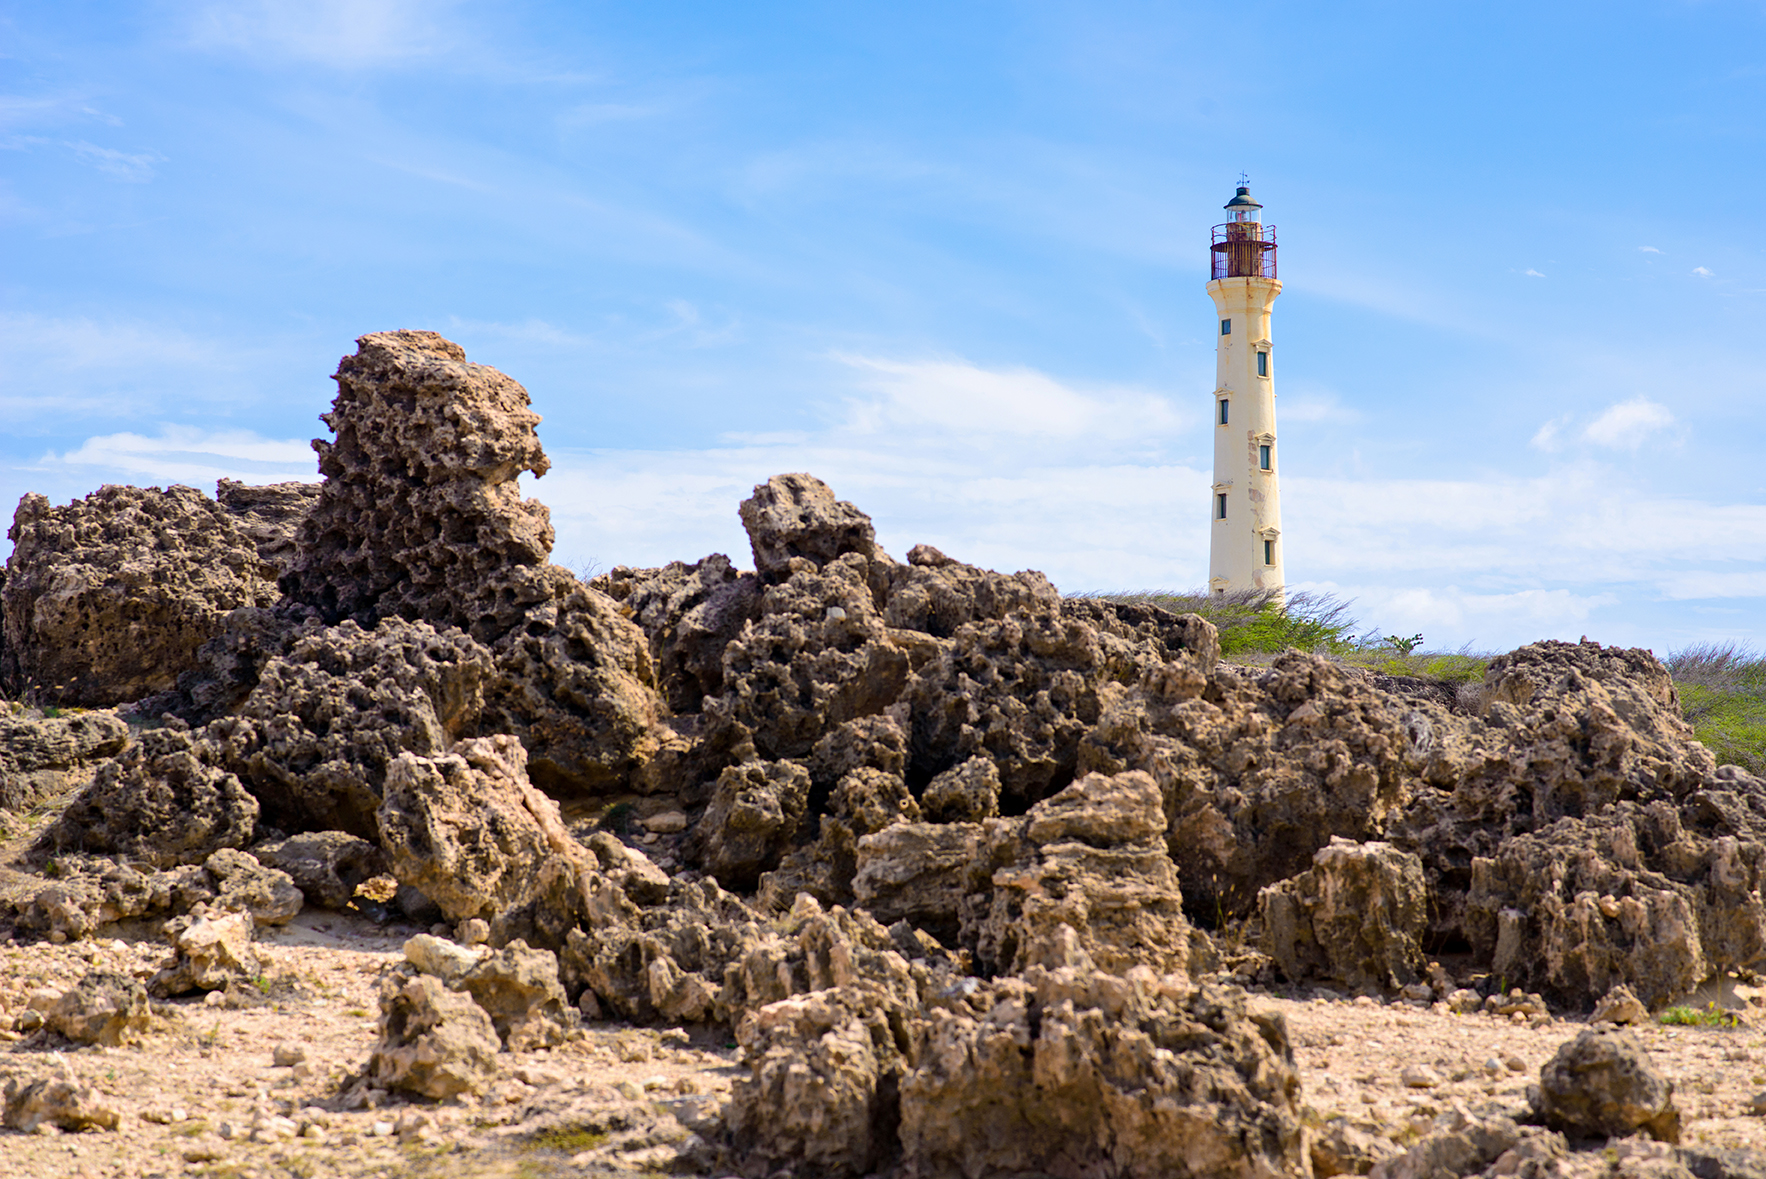 s2013-09-15 California Lighthouse Aruba_0167.jpg